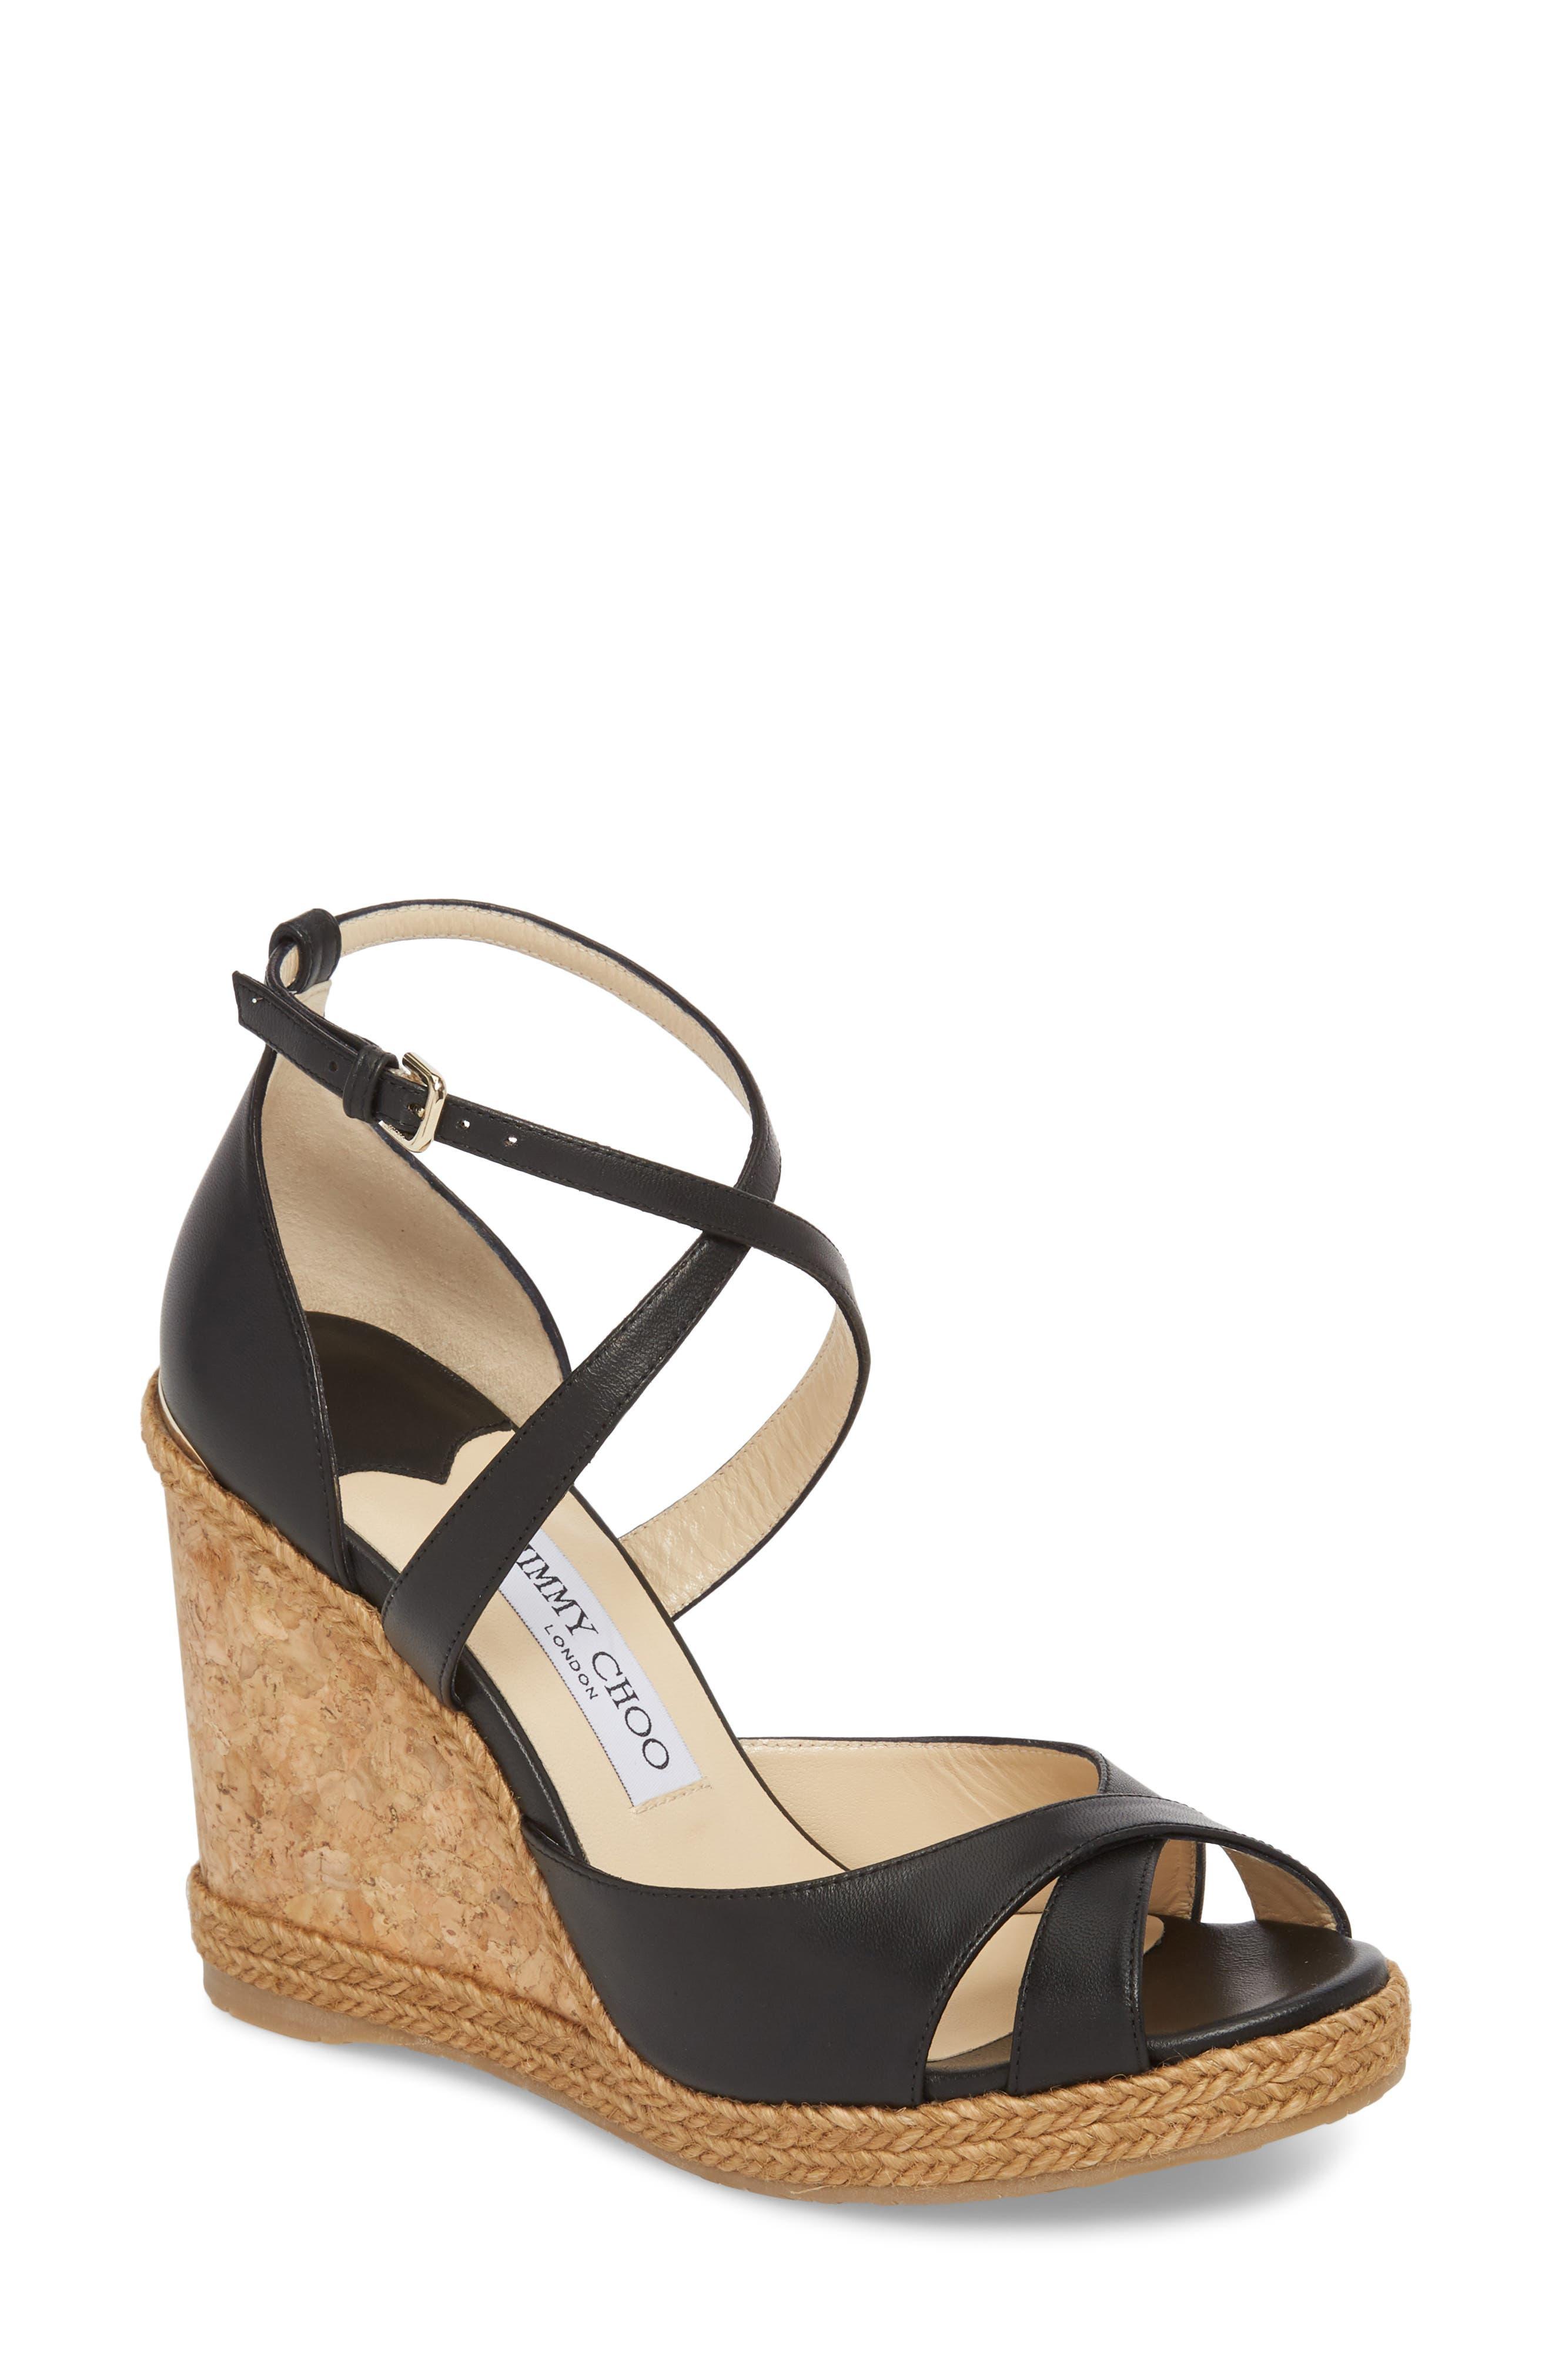 Alanah Espadrille Wedge Sandal,                         Main,                         color, BLACK